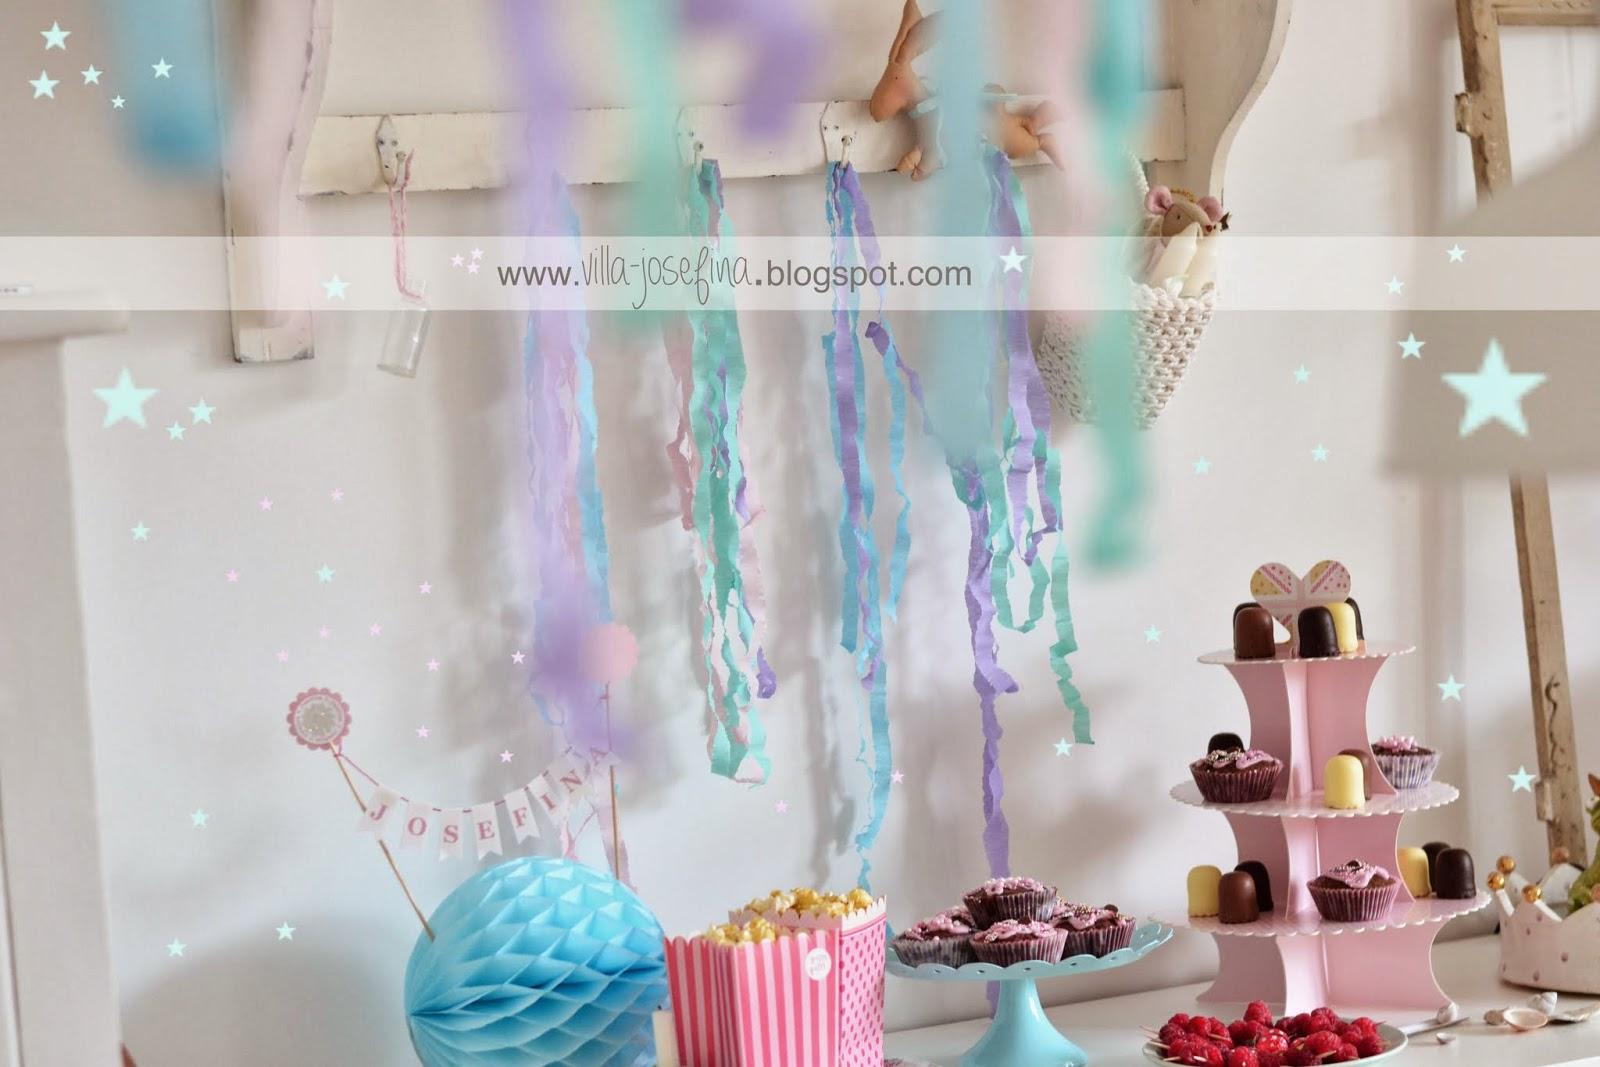 kindergeburtstag meerjungfrau unterwasserwelt villa josefina. Black Bedroom Furniture Sets. Home Design Ideas